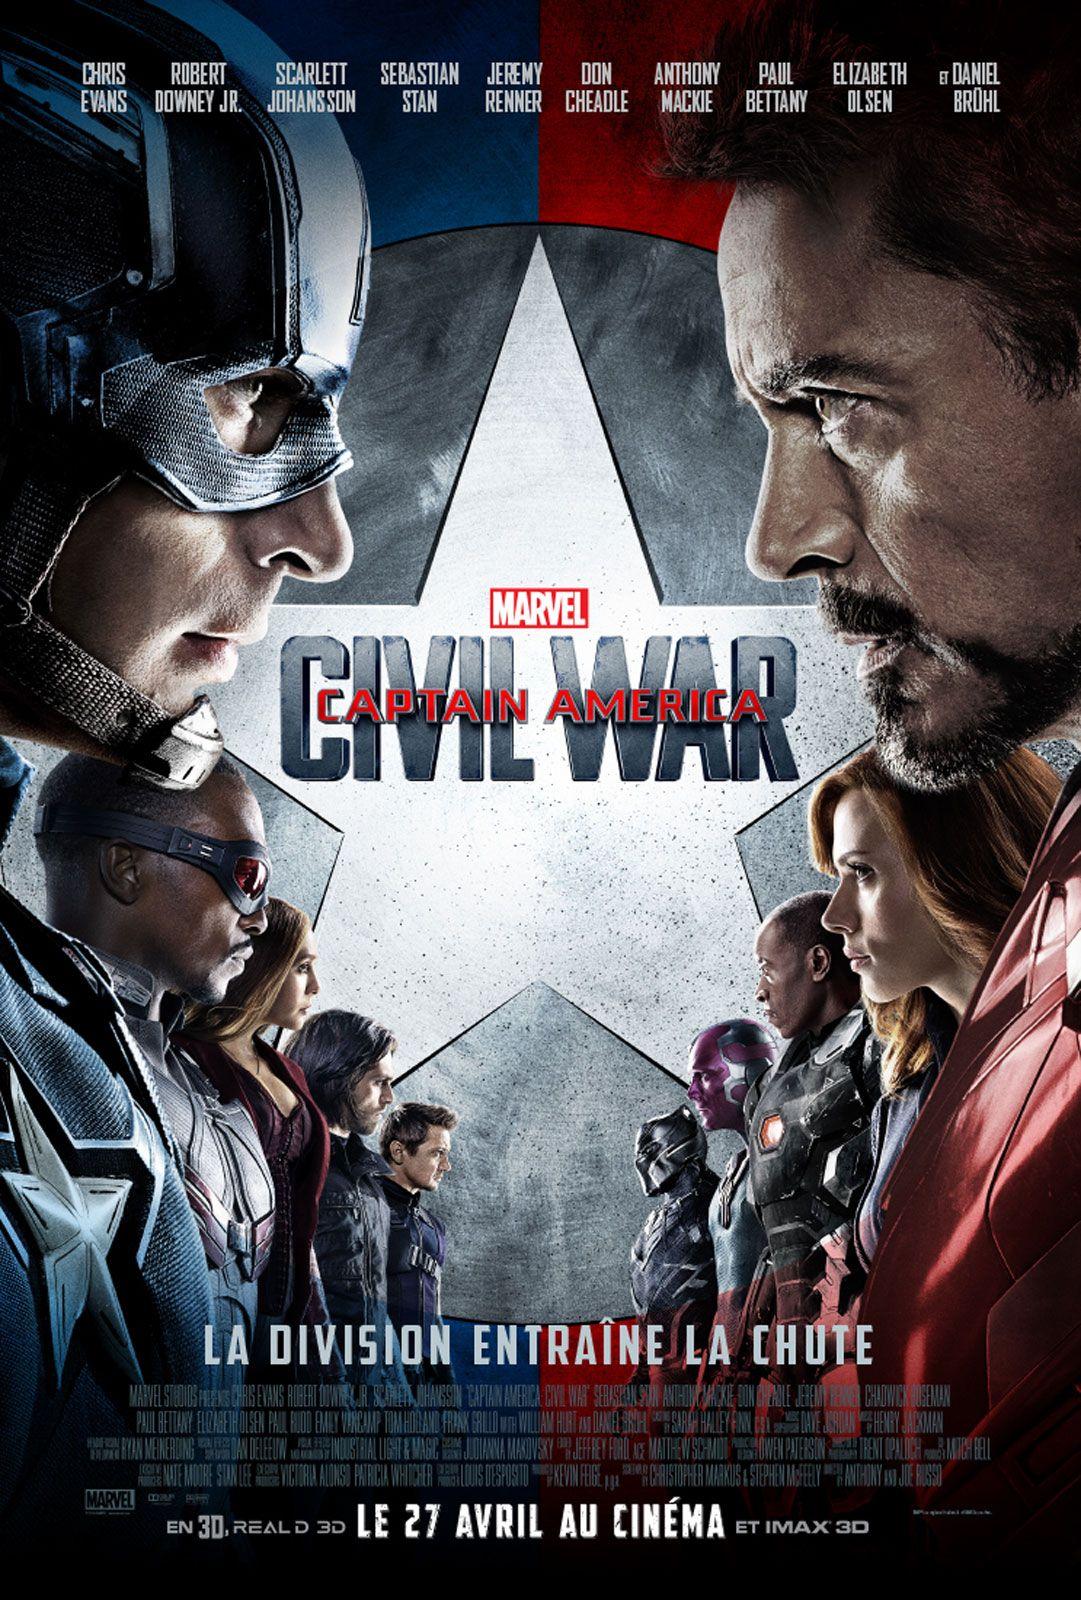 Captain America Civil War Captain America Civil War Poster Captain America Civil War Movie Marvel Captain America Civil War